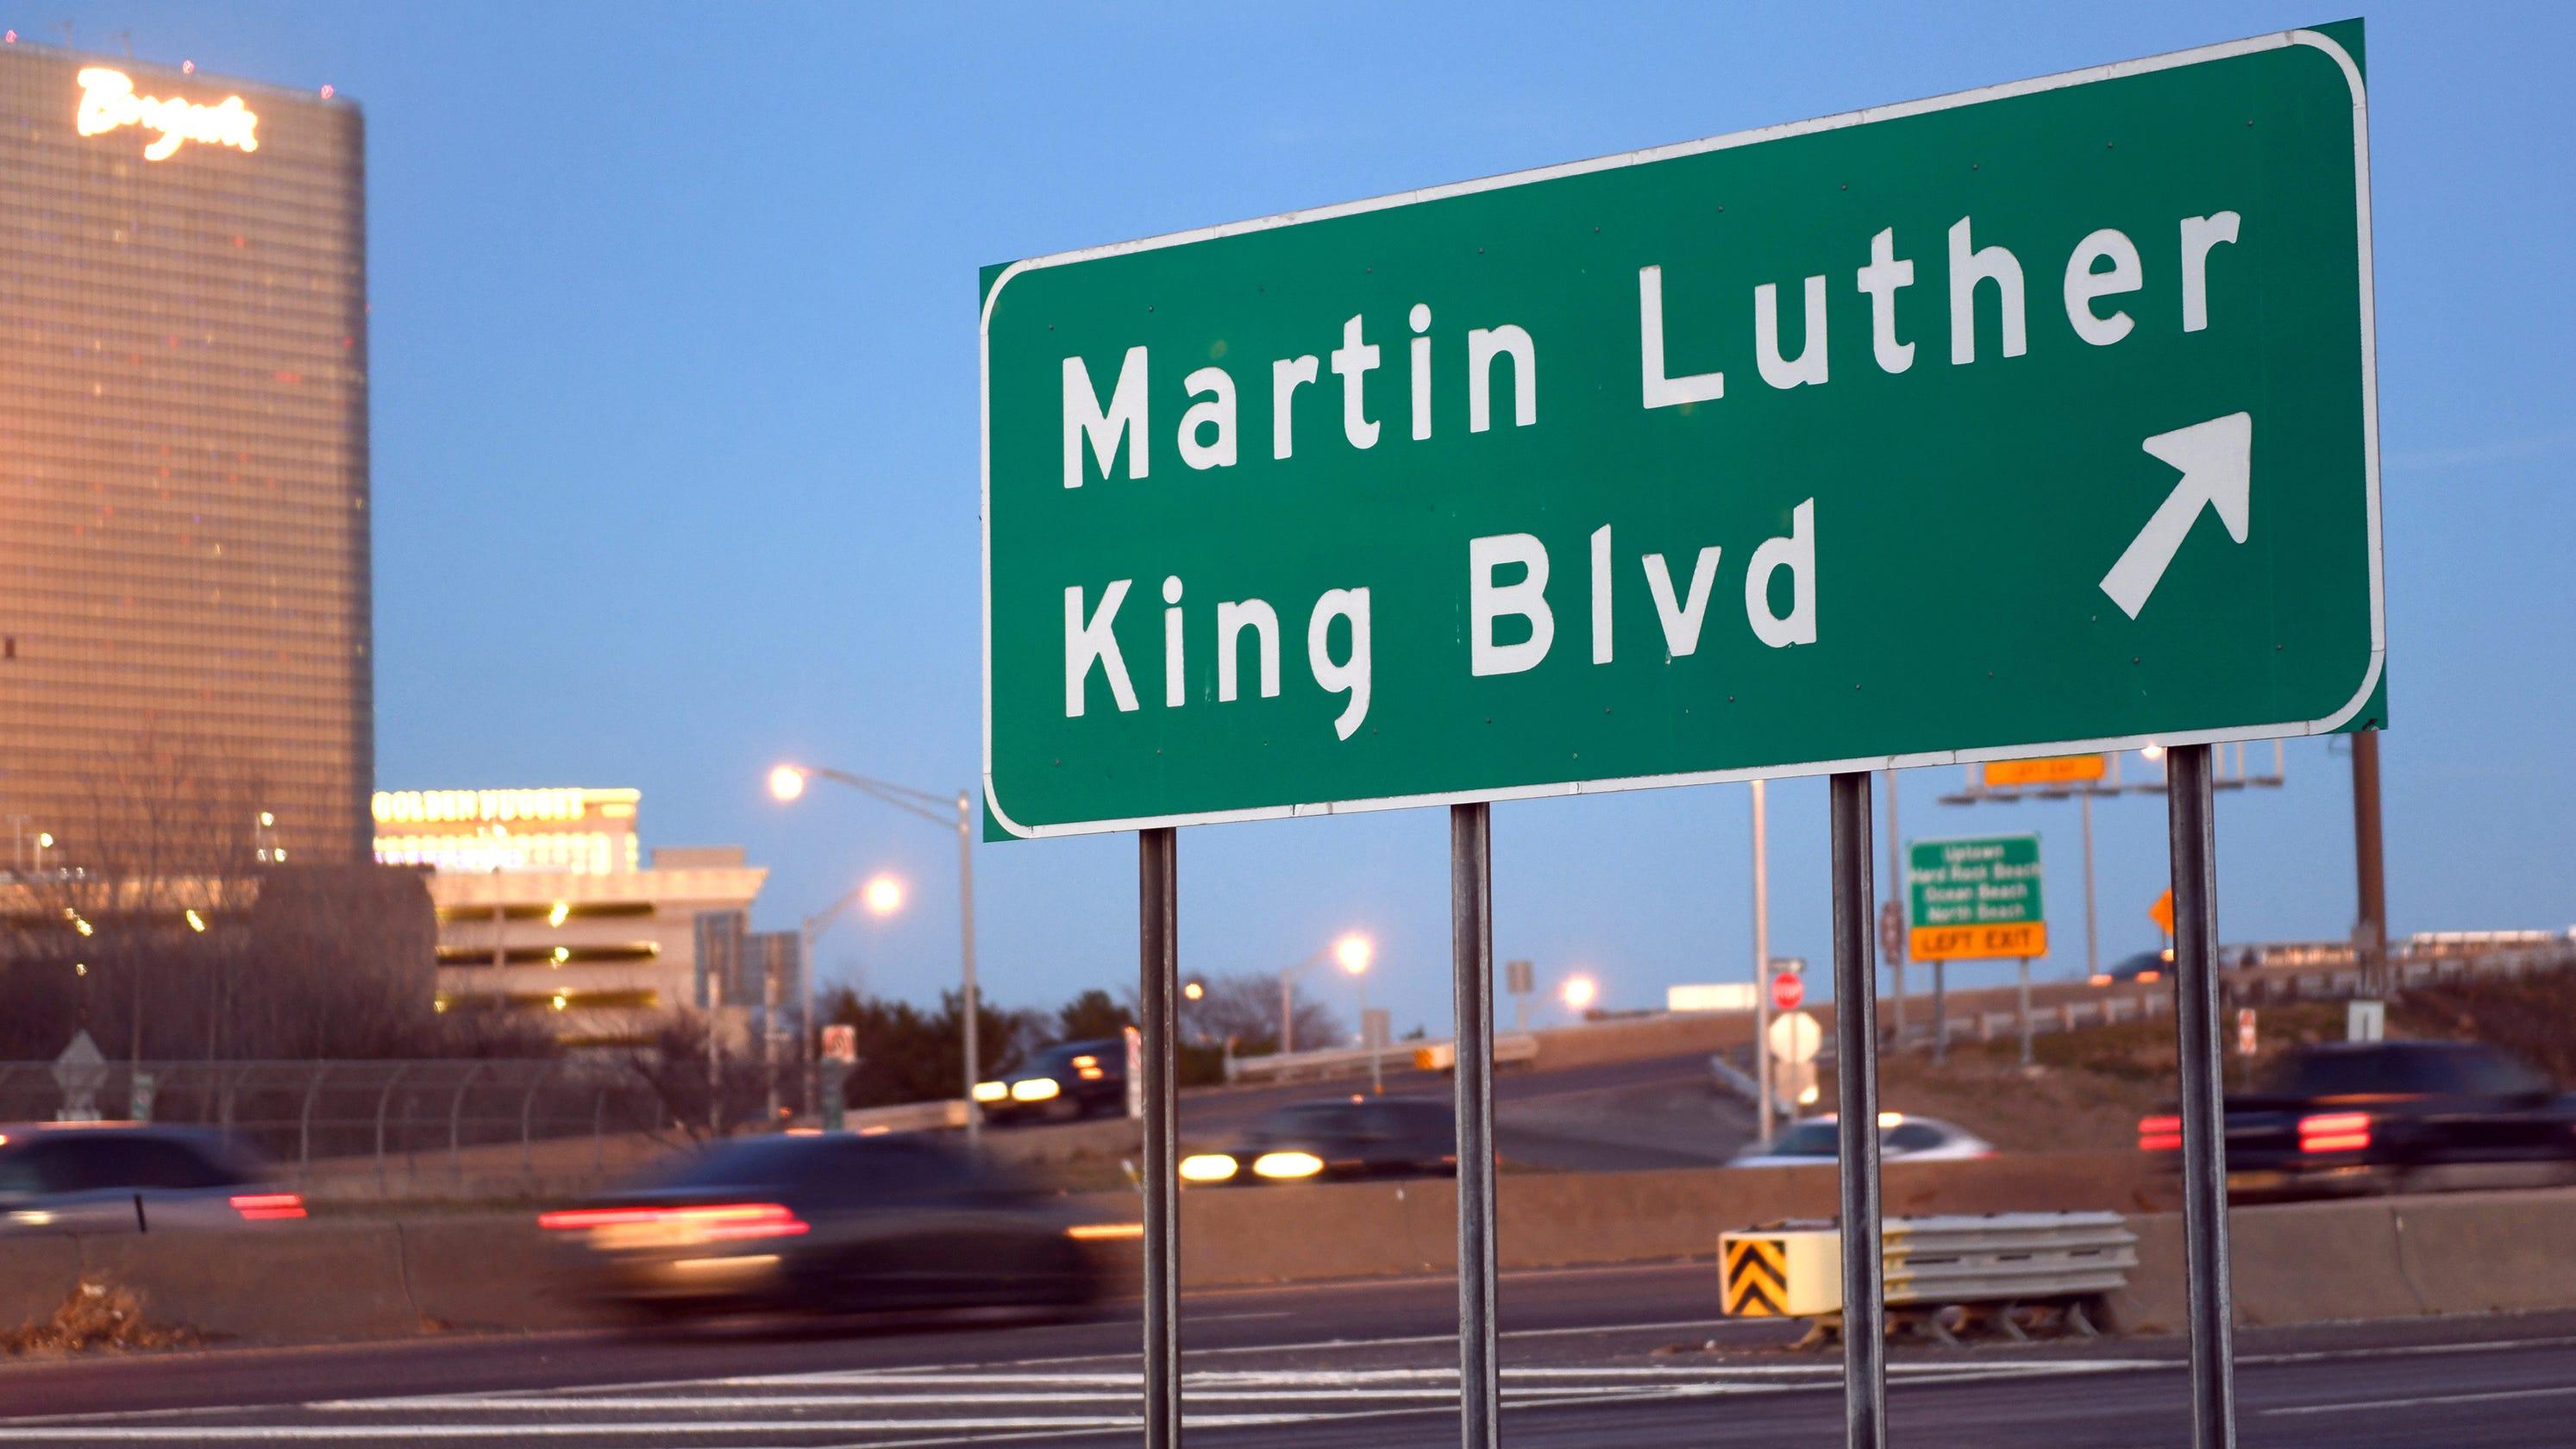 PHOTOS: Martin Luther King Jr. Boulevard in Atlantic City